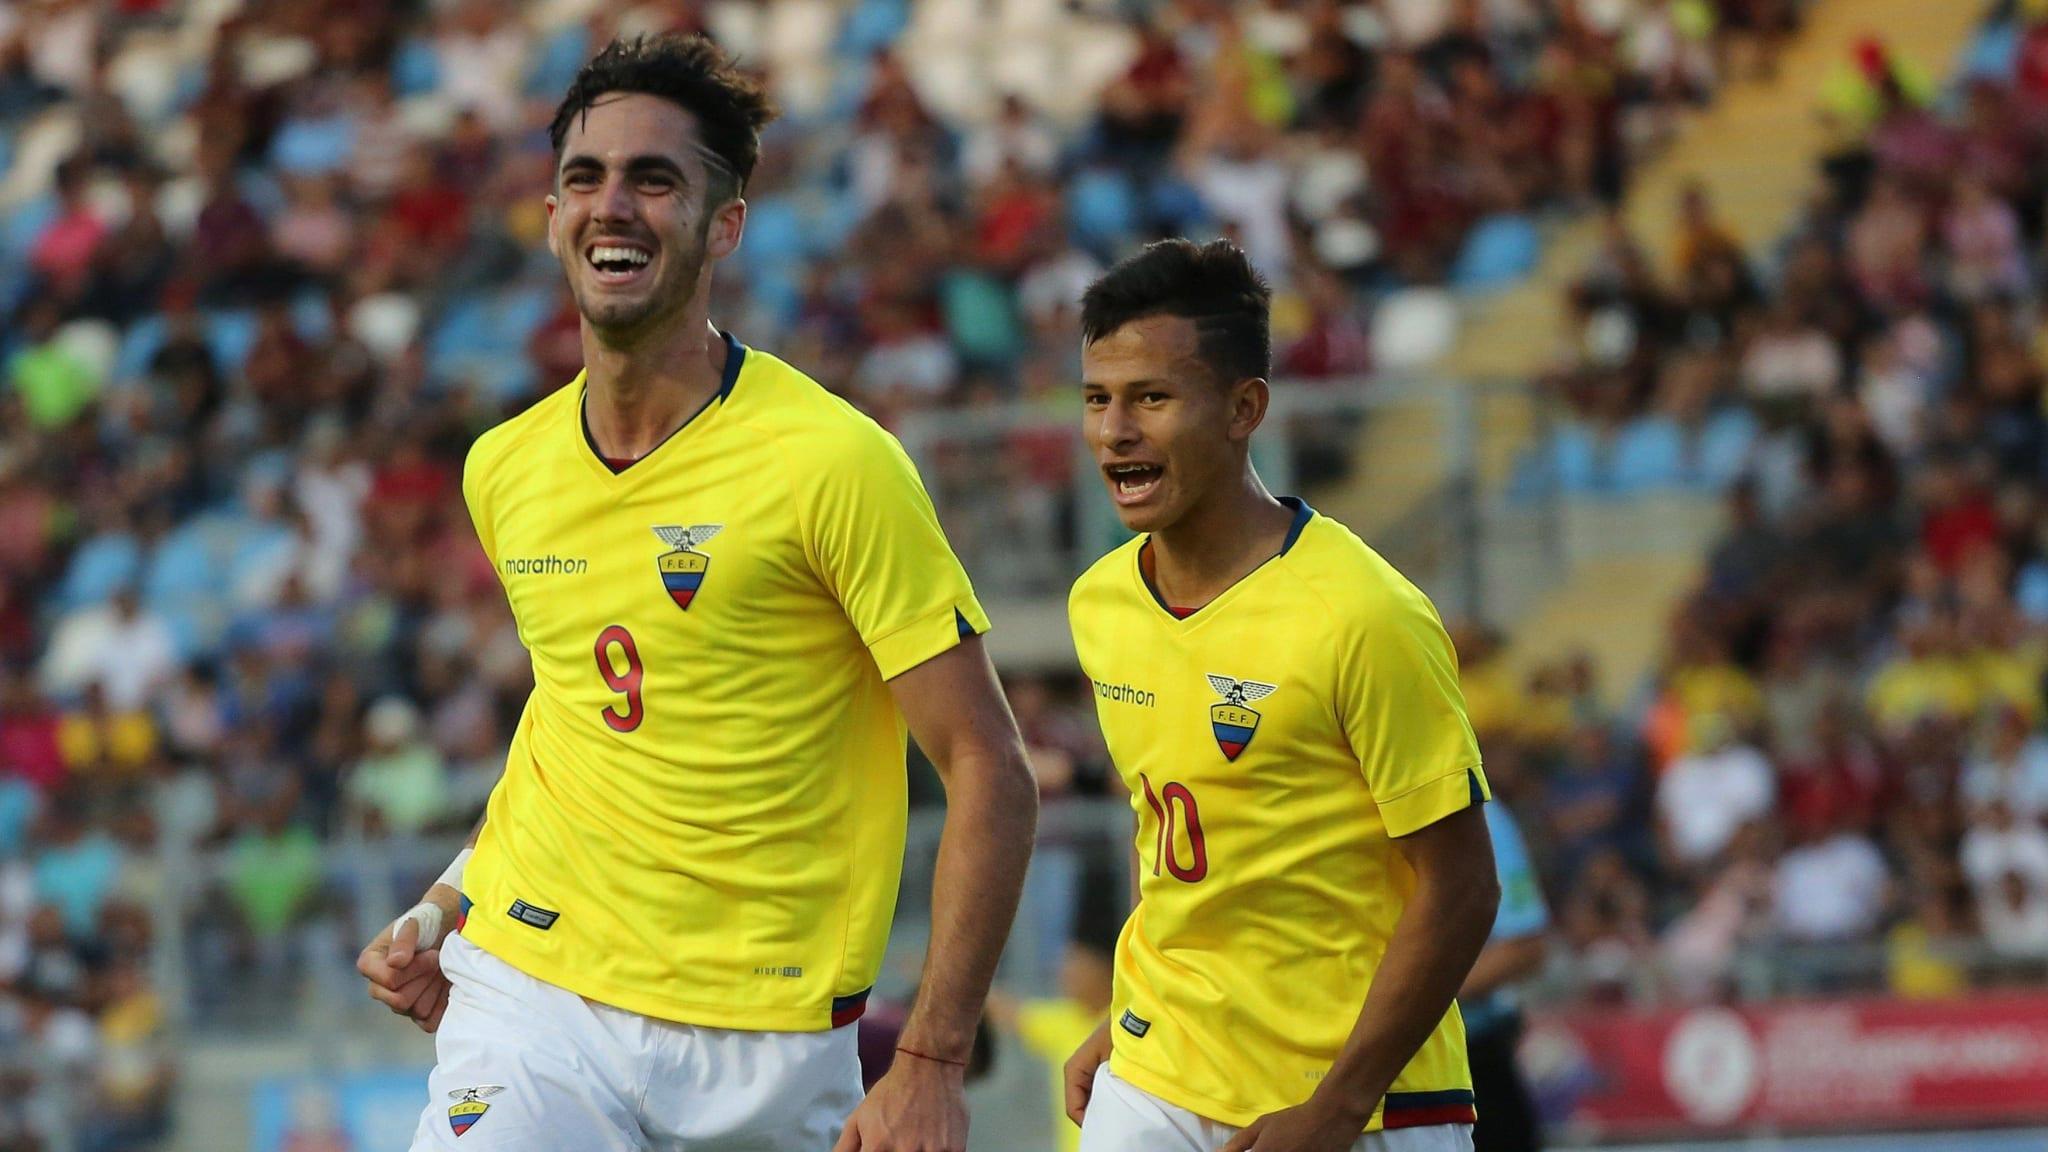 Leonardo Campana (L) of Ecuador celebrates after scoring against Venezuela